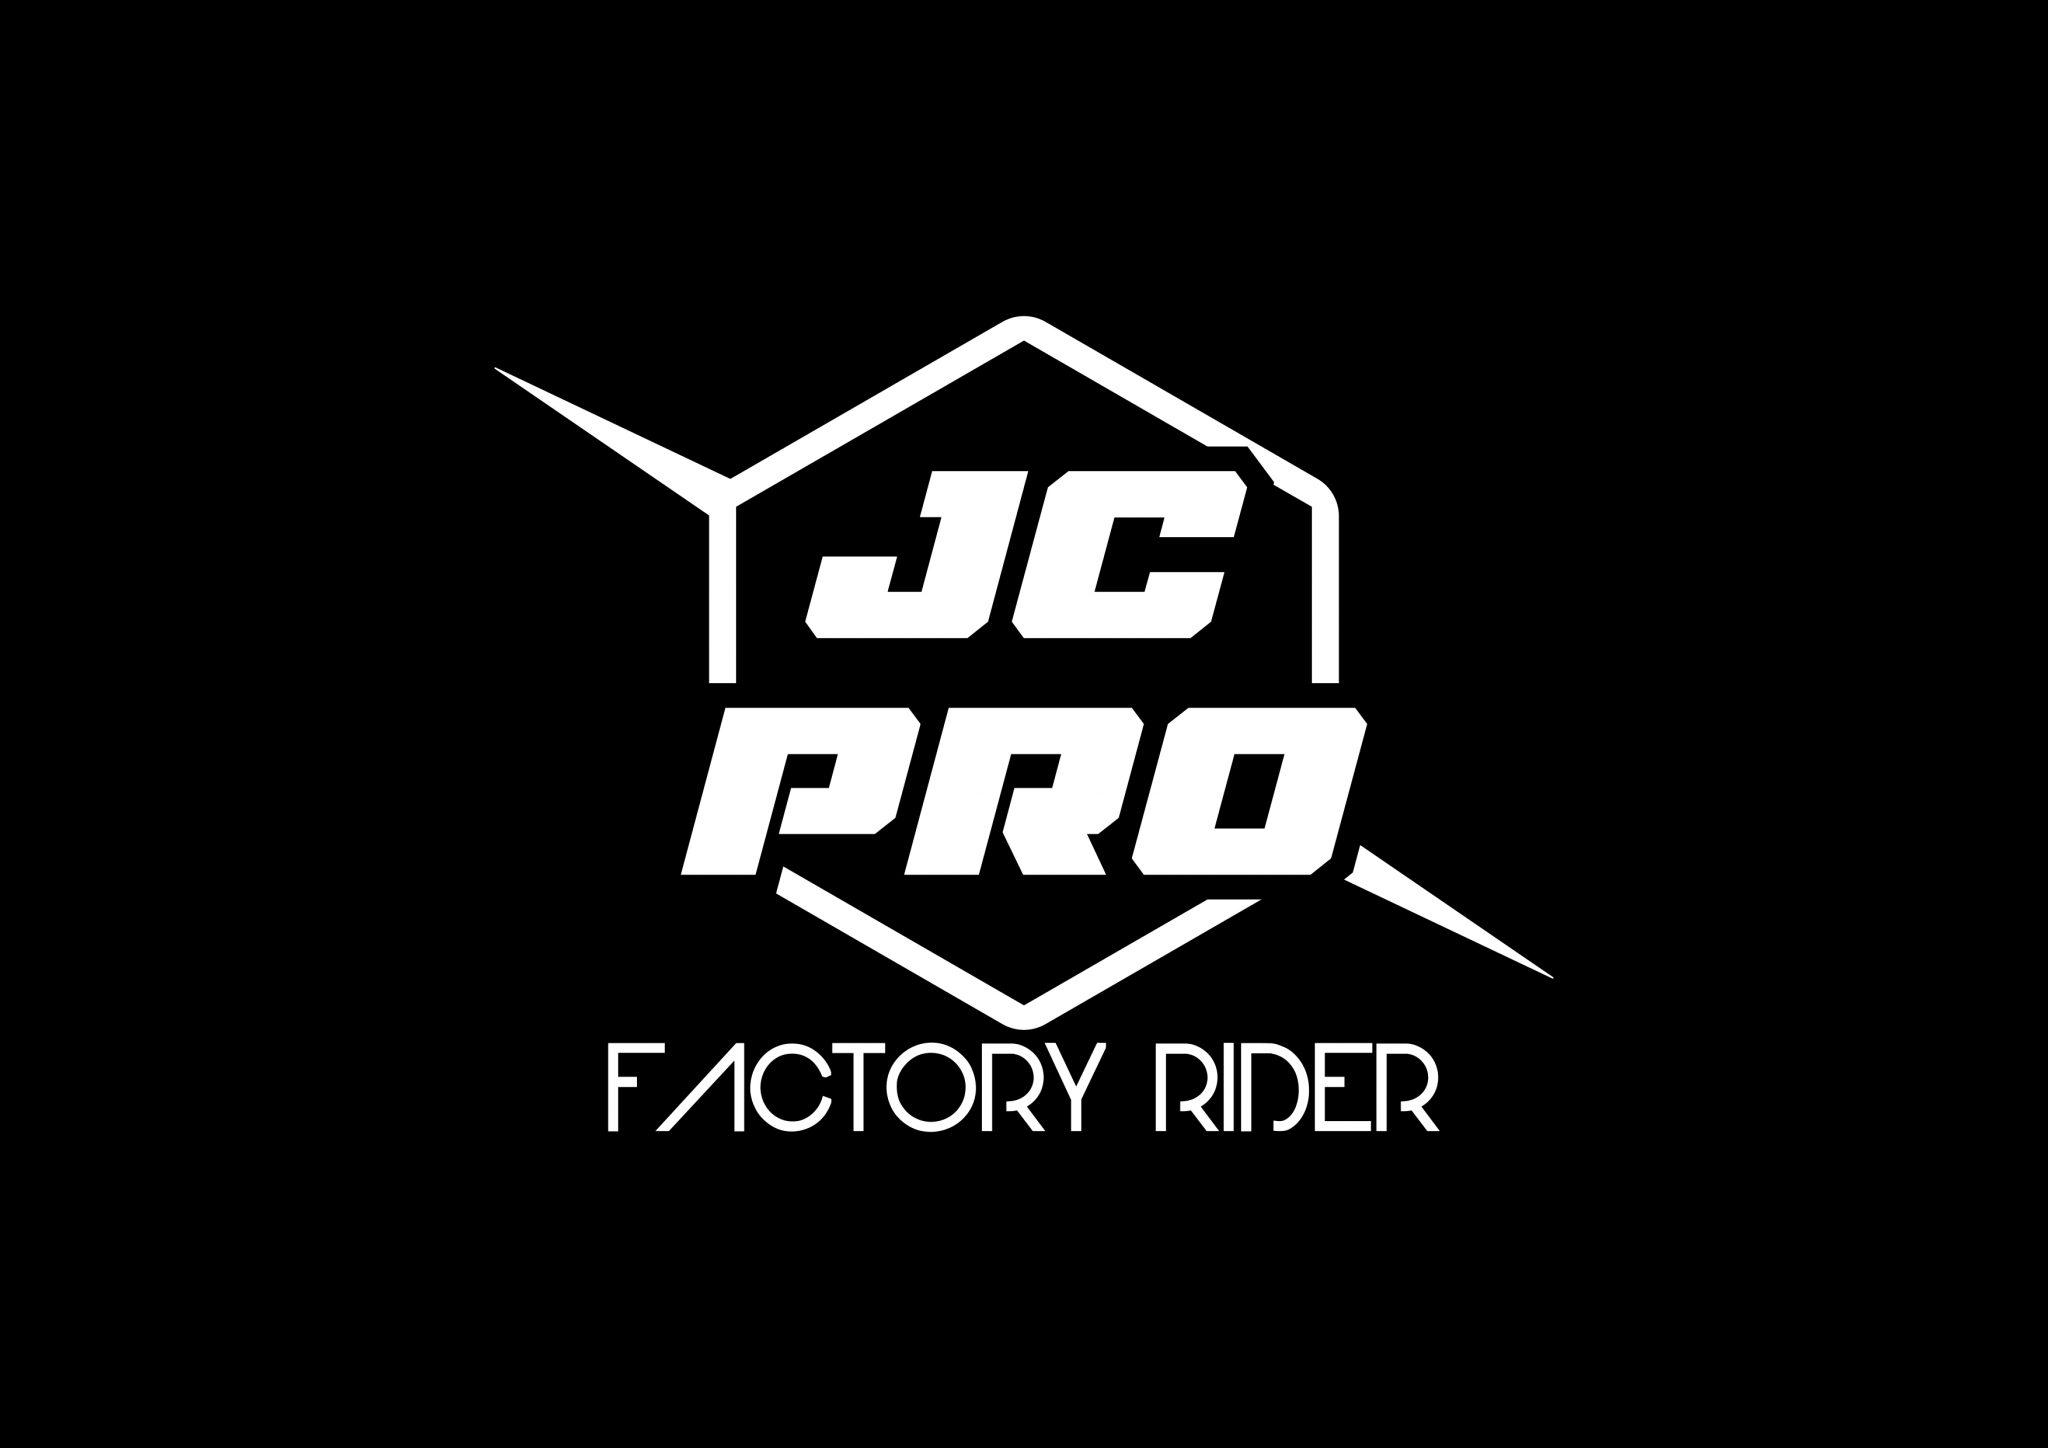 JC Pro Factory Rider Logo 2